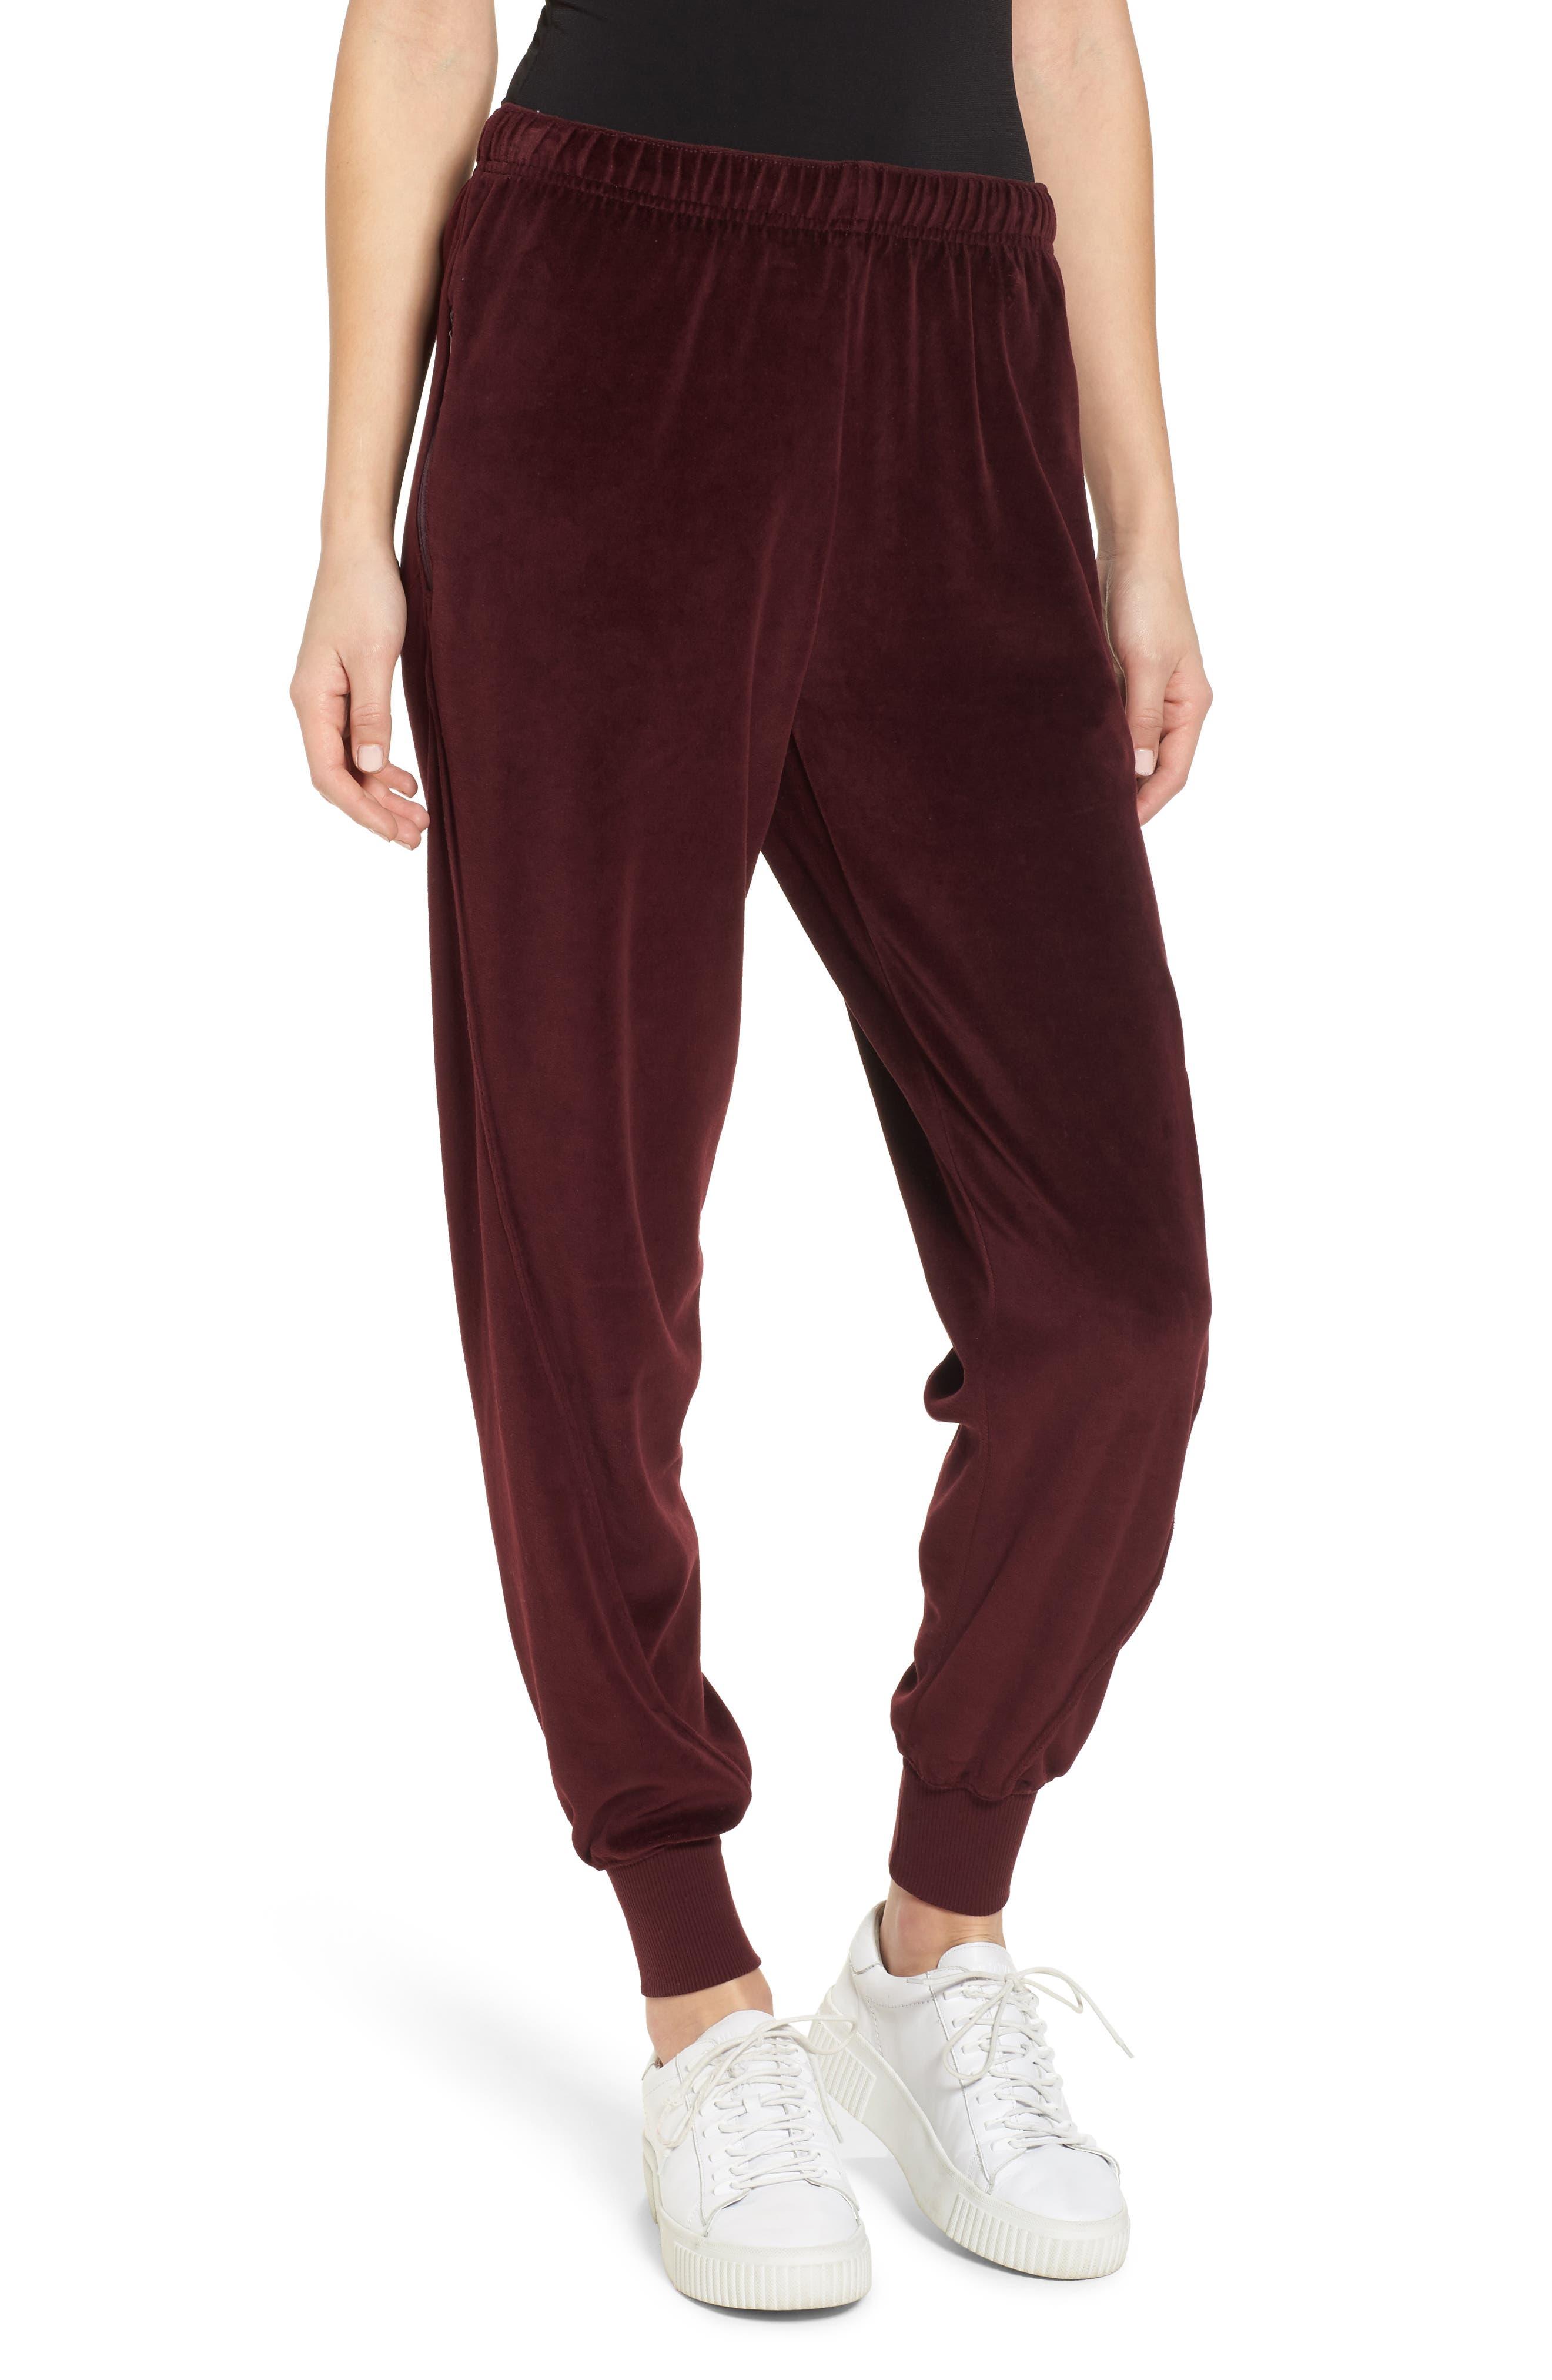 Velour Jogger Pants,                         Main,                         color, Good Burgundy